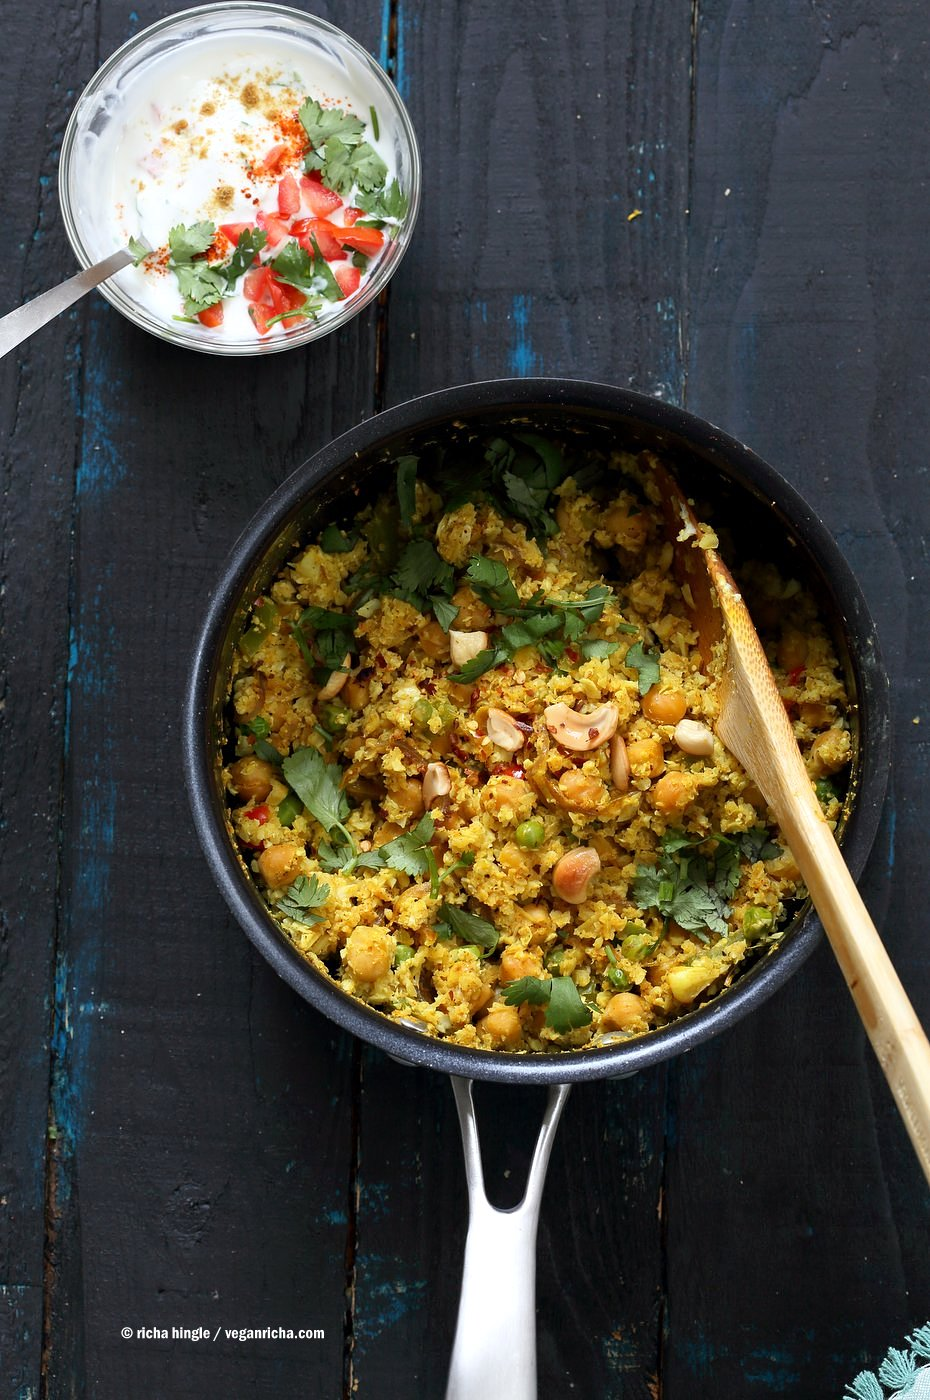 Chickpea Cauliflower Rice Biryani. 1 pot 30 Minute Meal with Veggies, Chickpeas, Spices, and Cauliflower Rice. Served with tomato raita. Vegan Gluten-free Soy-free Grain-free Recipe| VeganRicha.com